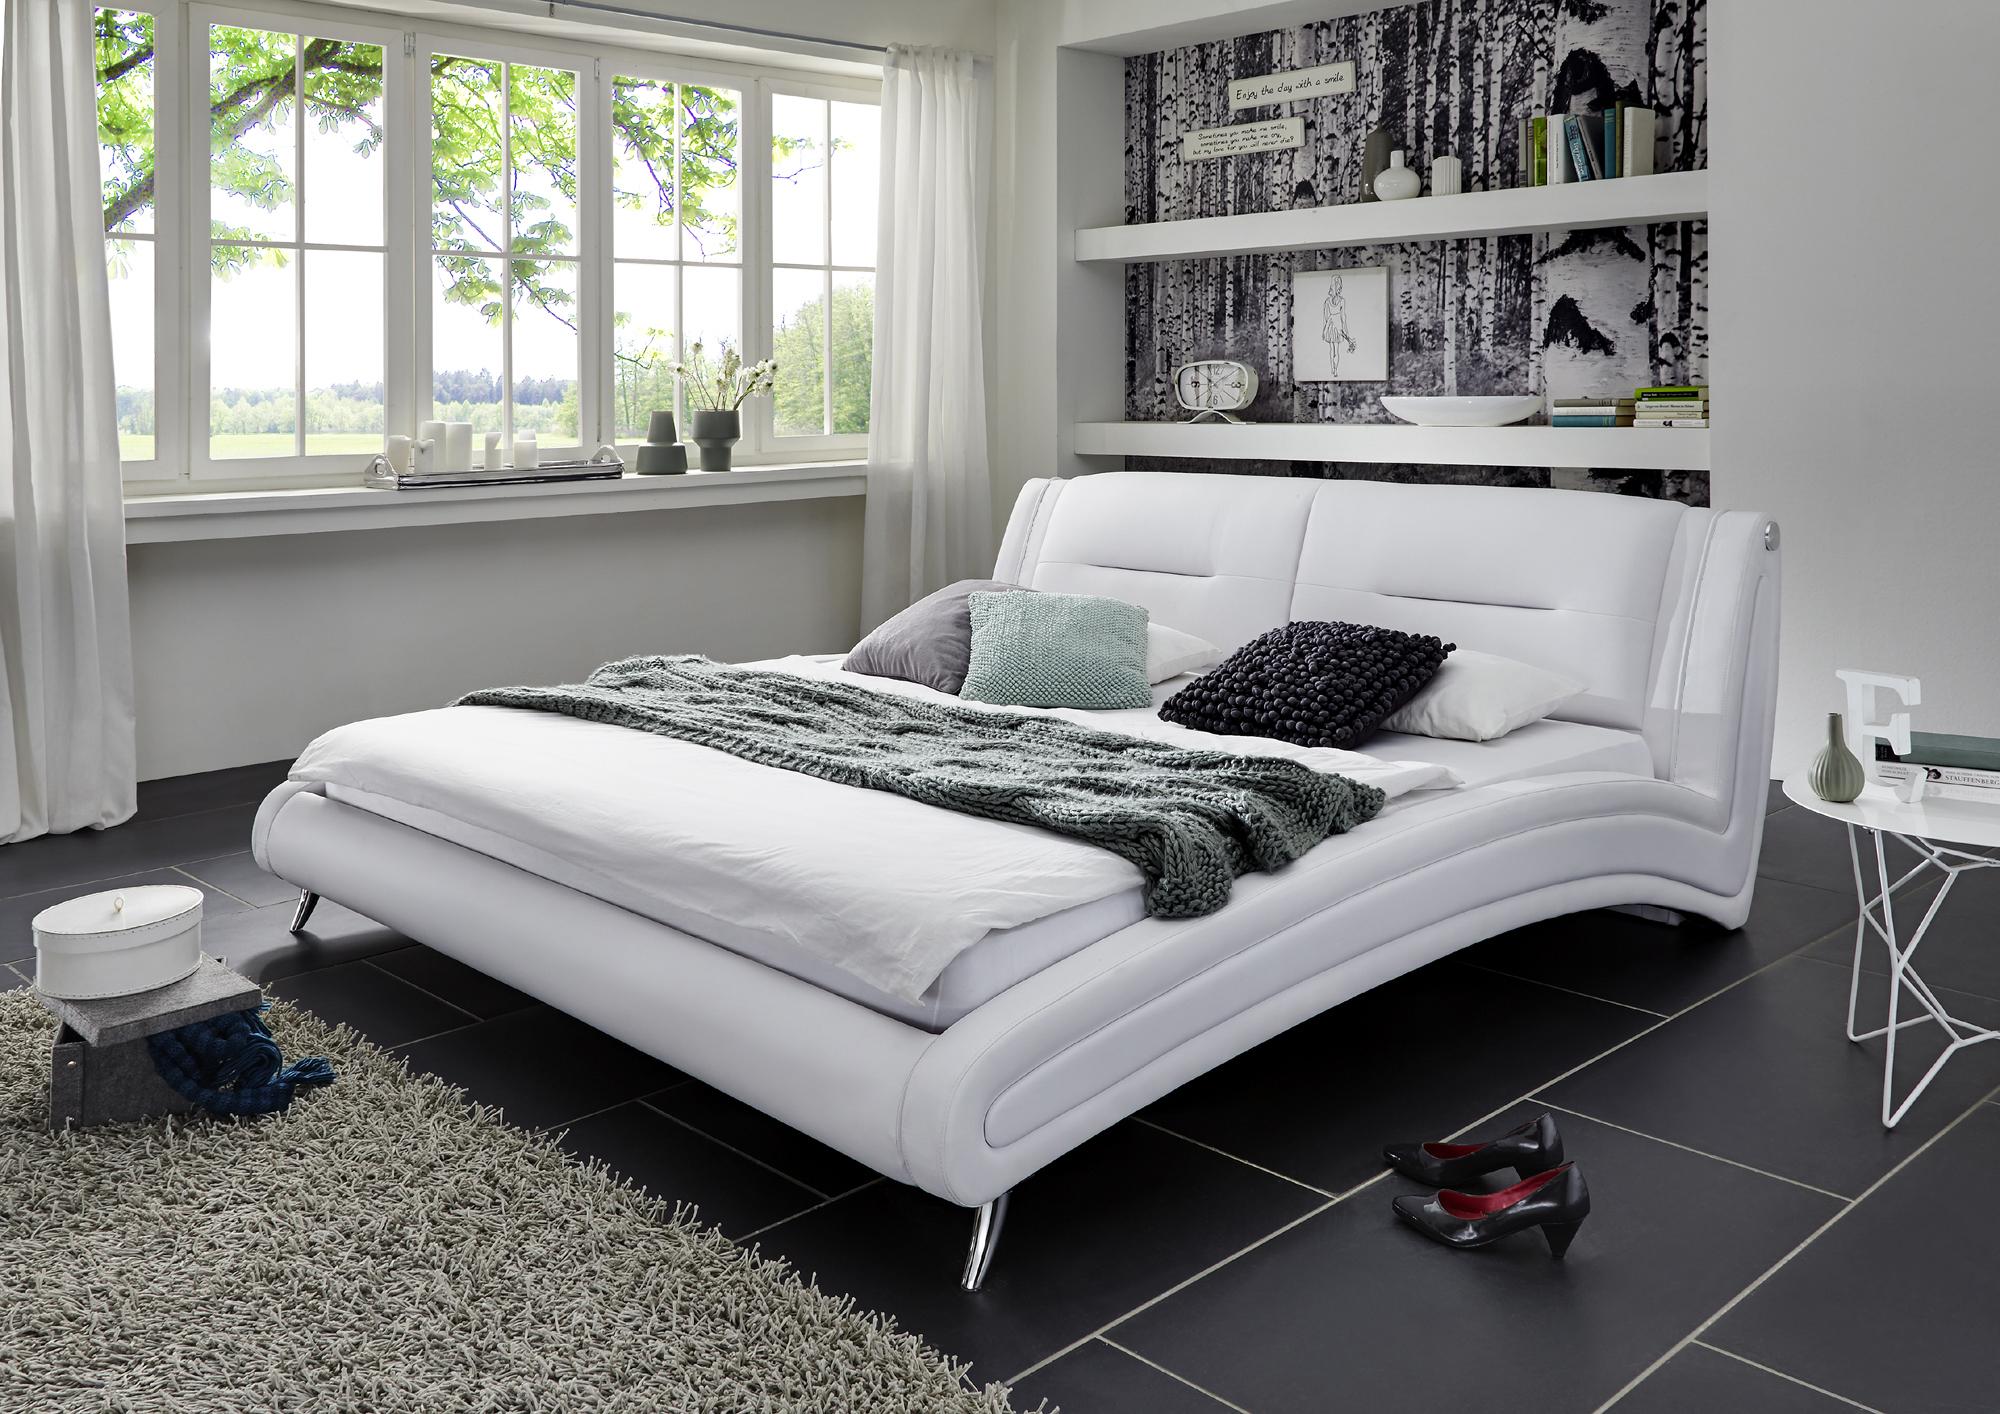 sam design bett 120 x 200 cm wei swing auf lager. Black Bedroom Furniture Sets. Home Design Ideas